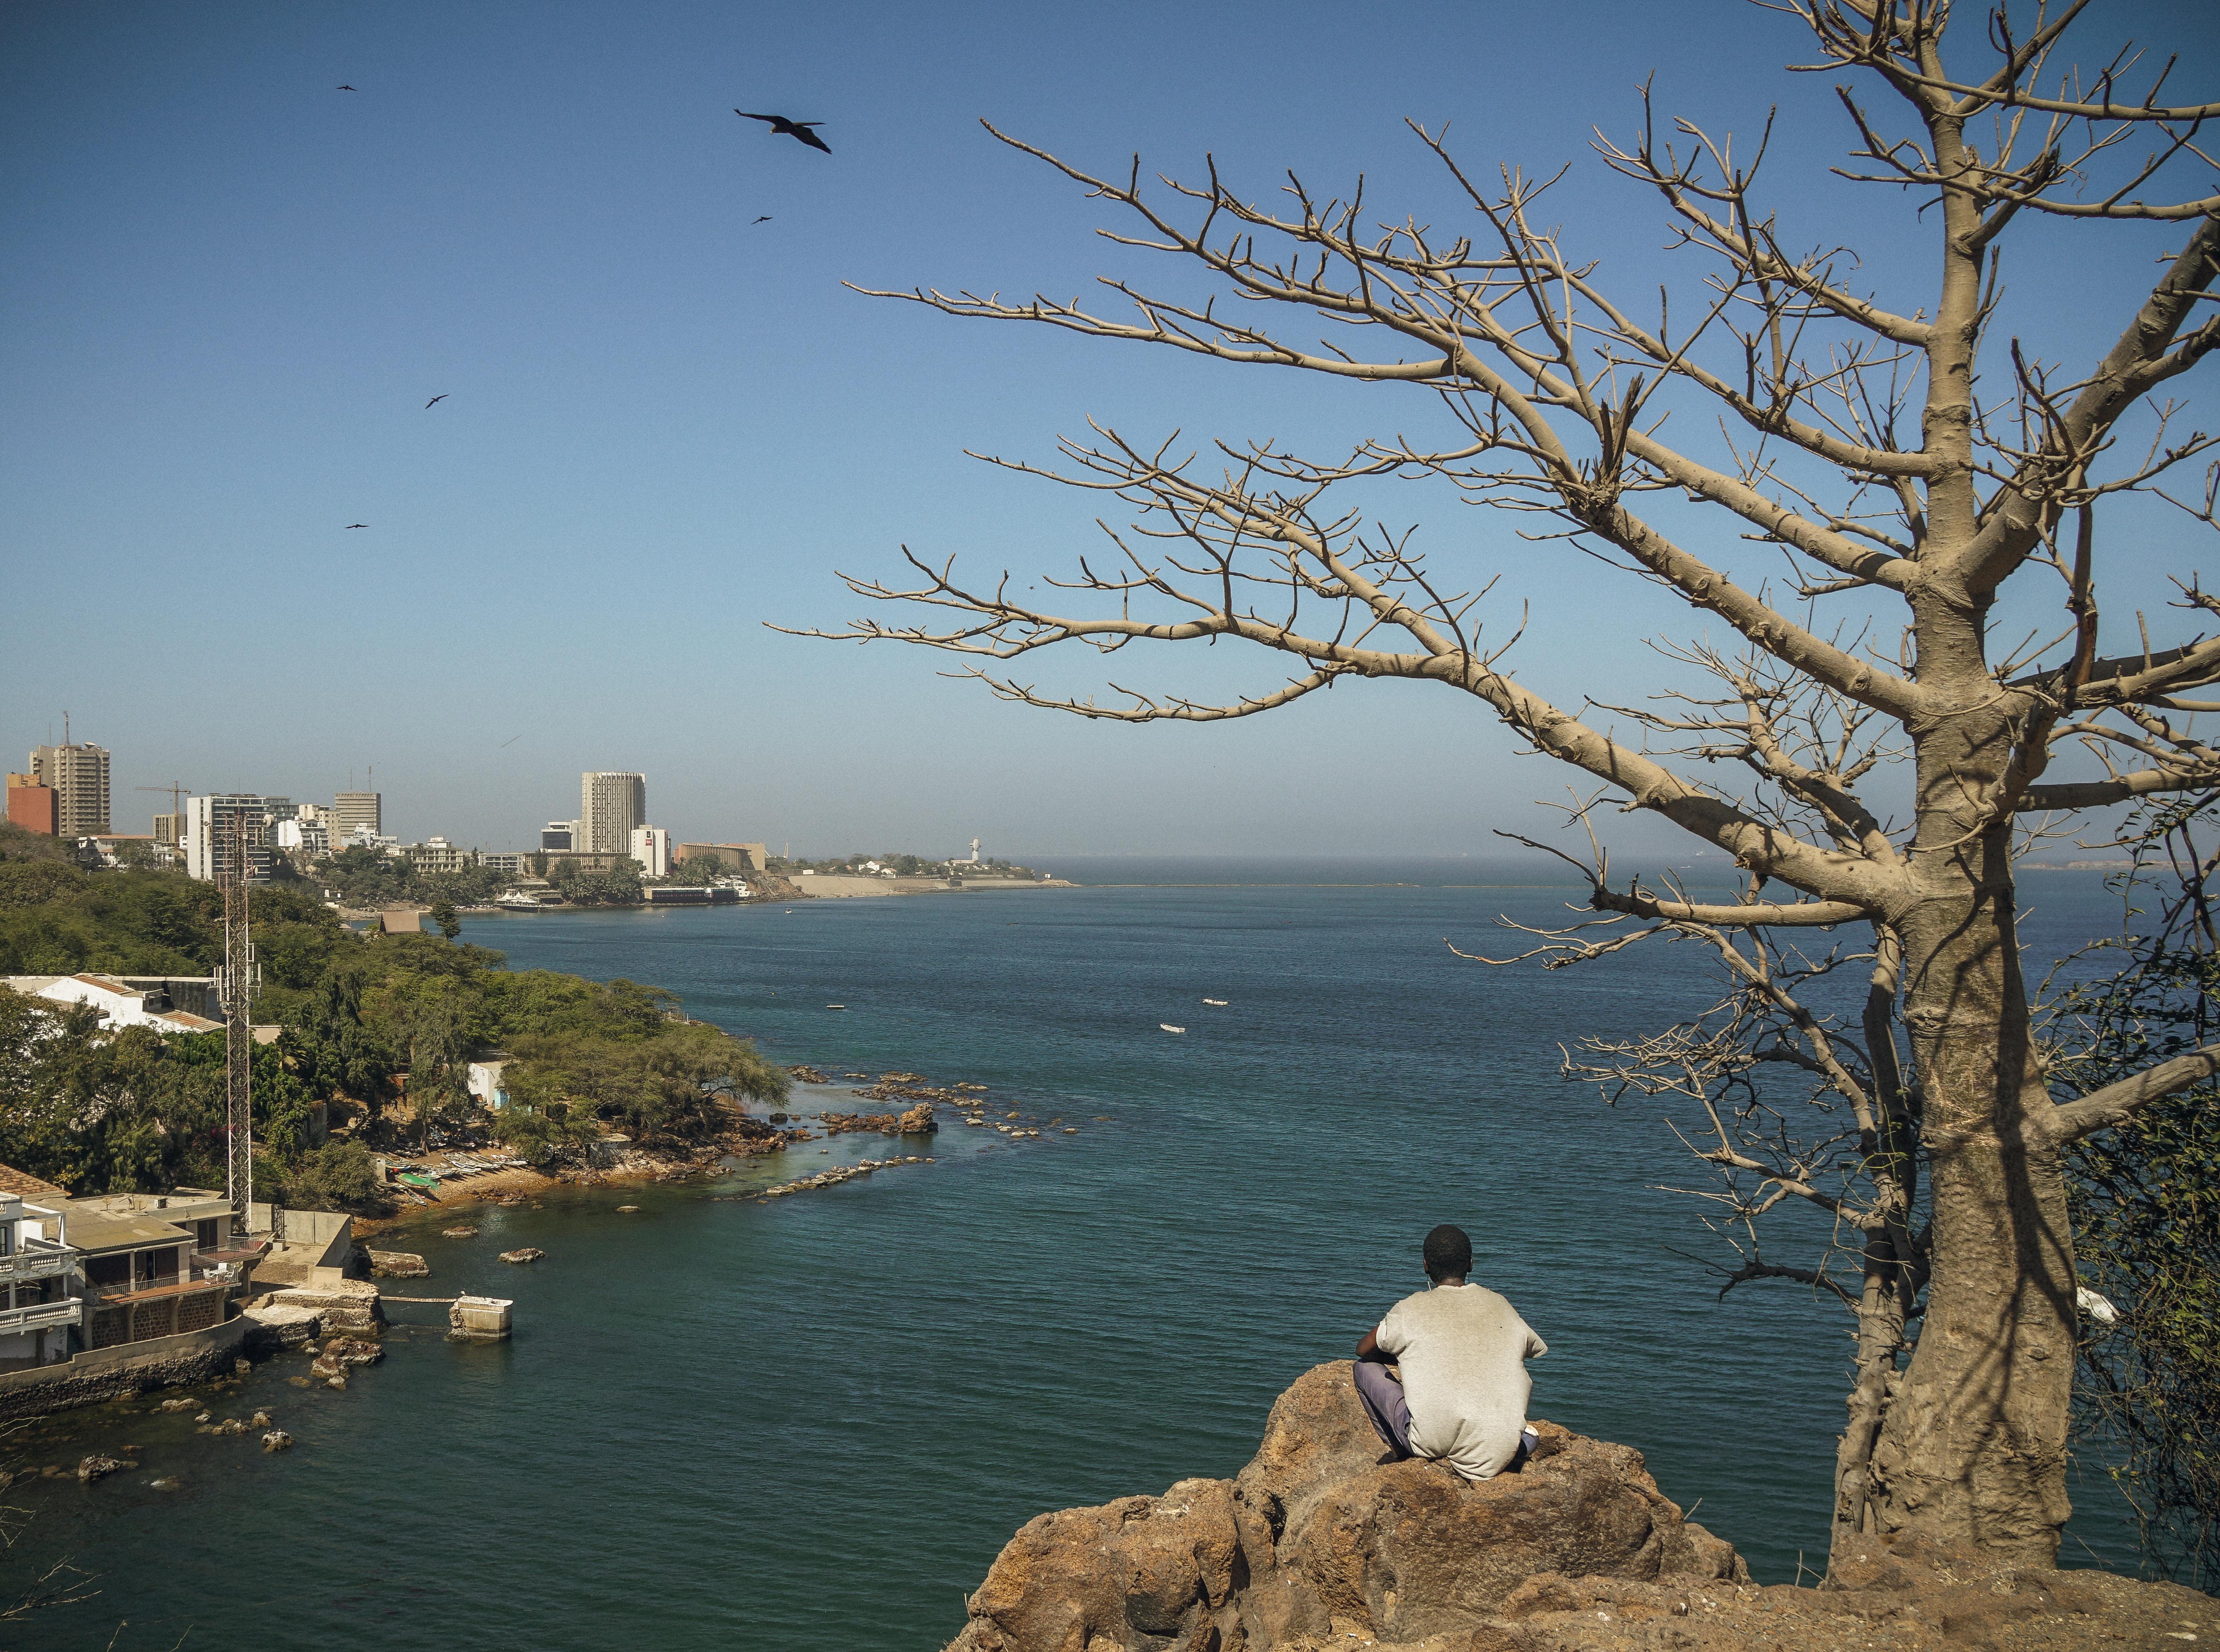 Views from Dakar's Corniche